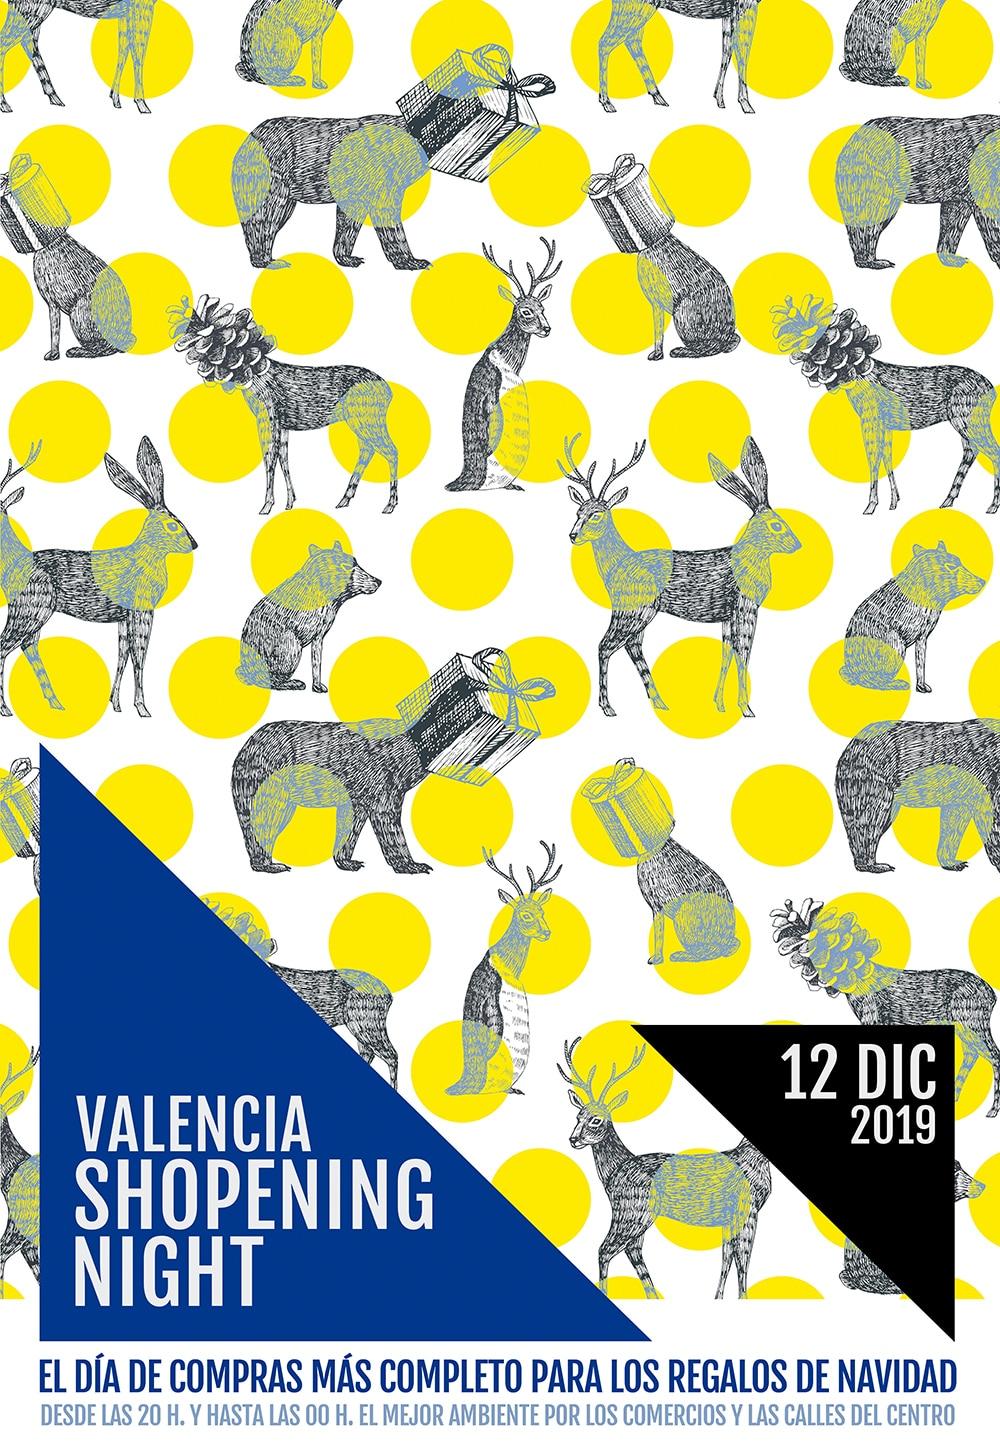 Valencia Shopening Night Diciembre